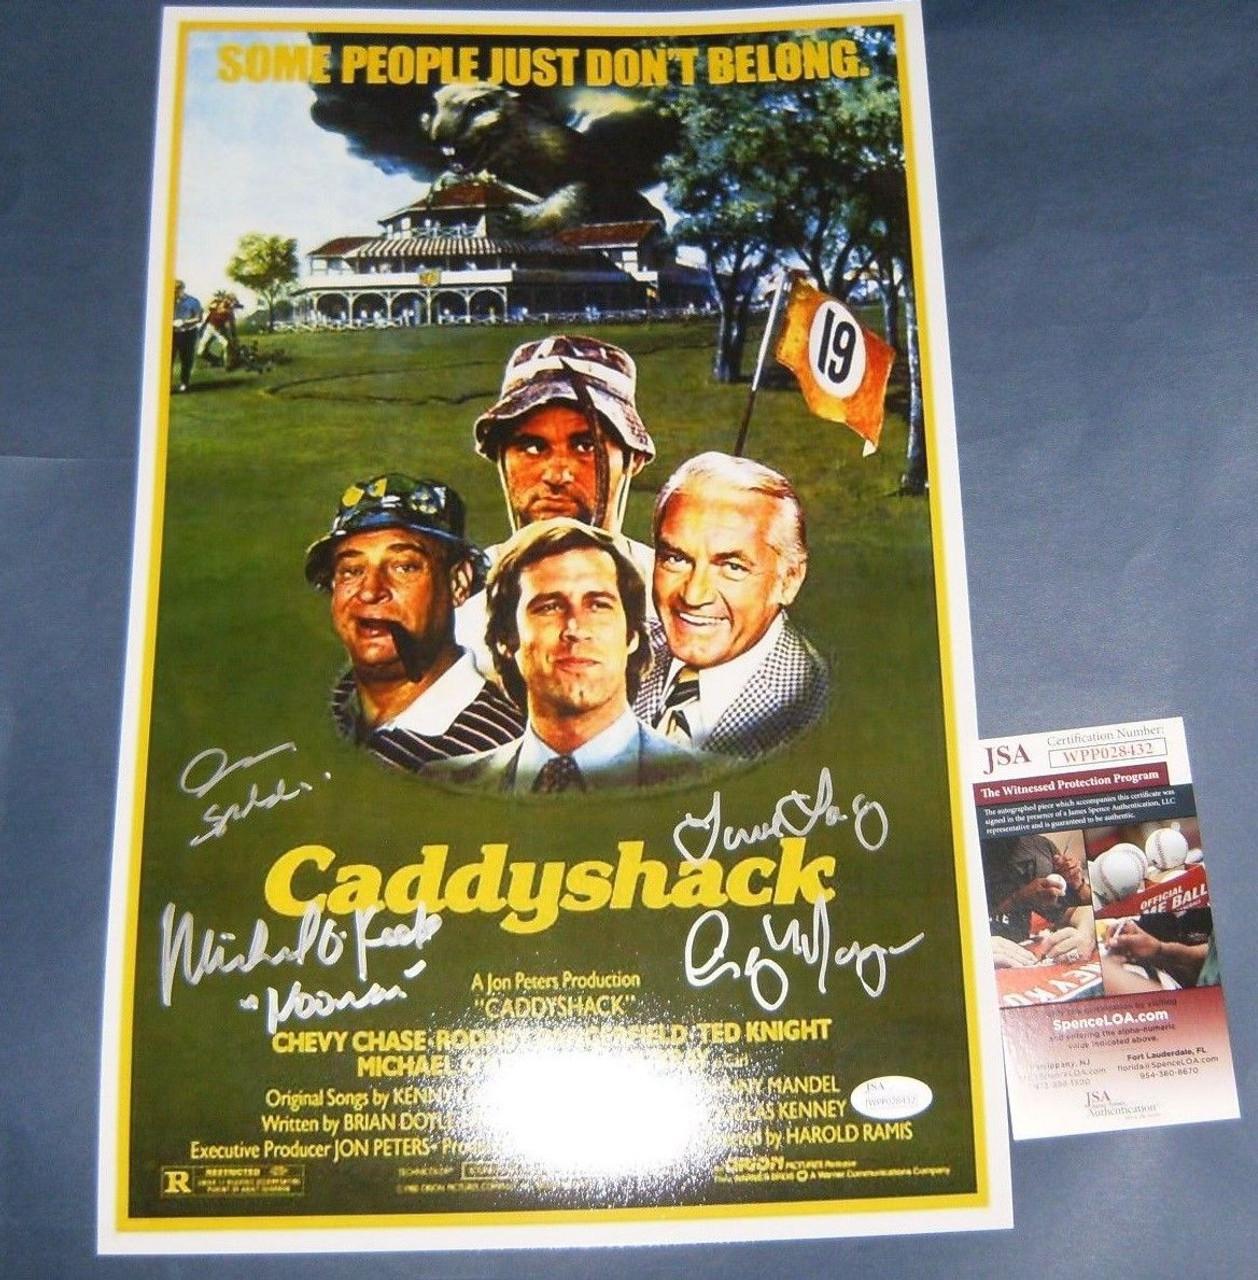 caddyshack autographed 11x17 movie photo noonan lacey spaulding jsa